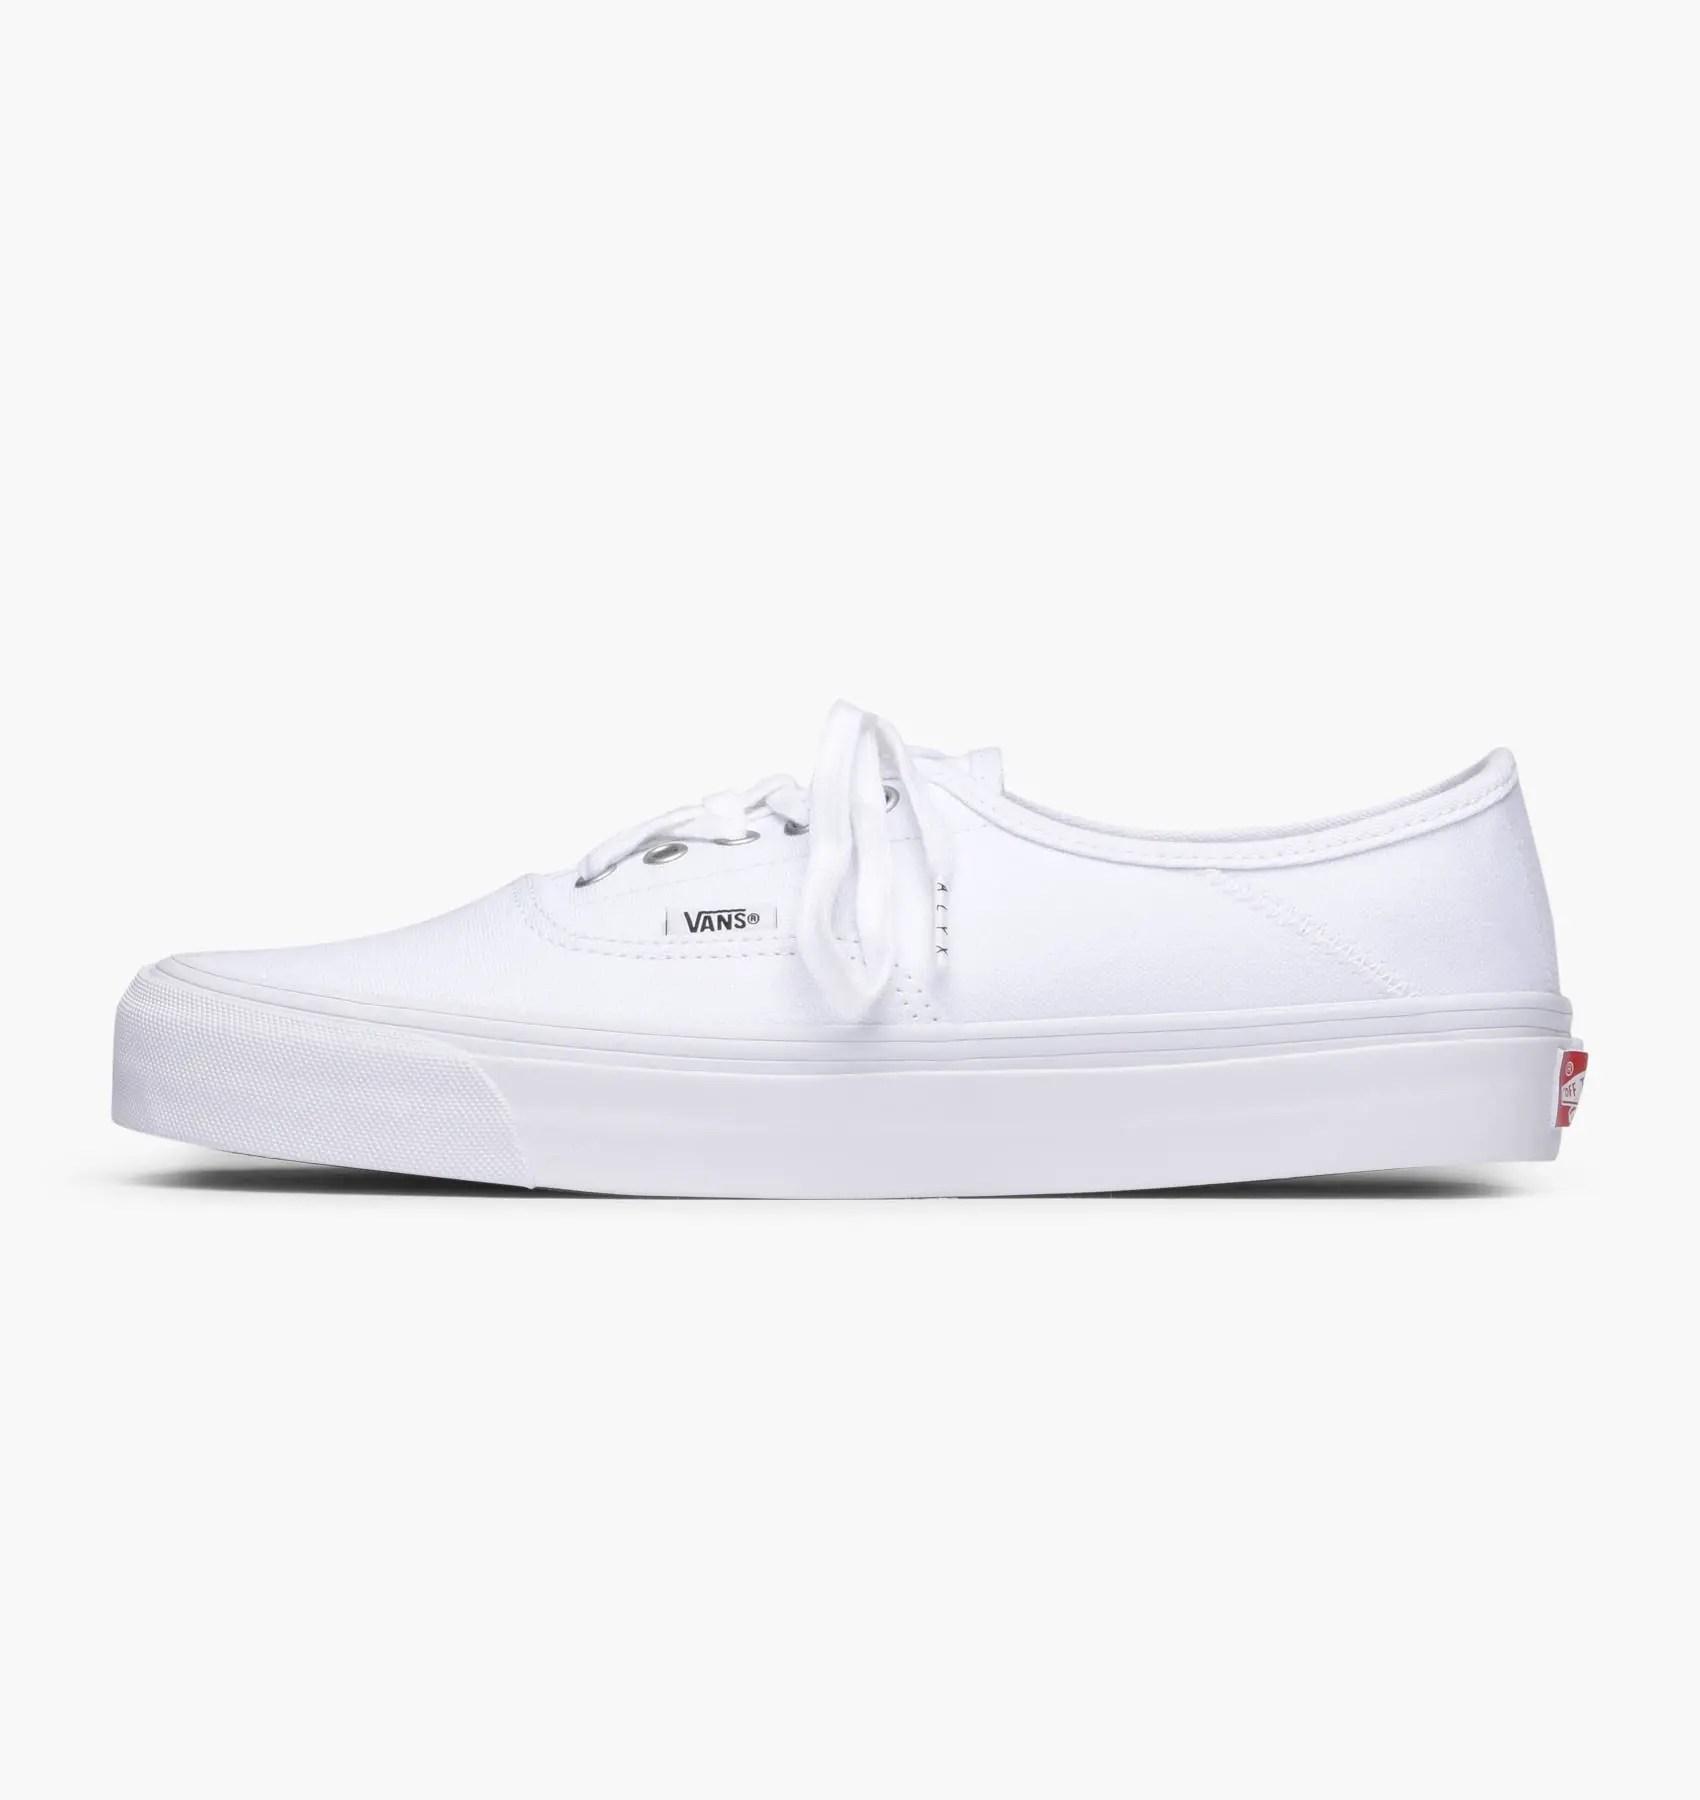 vans-vault-x-alyx-og-style-43-lx-va3dpbok9-alyx-true-white